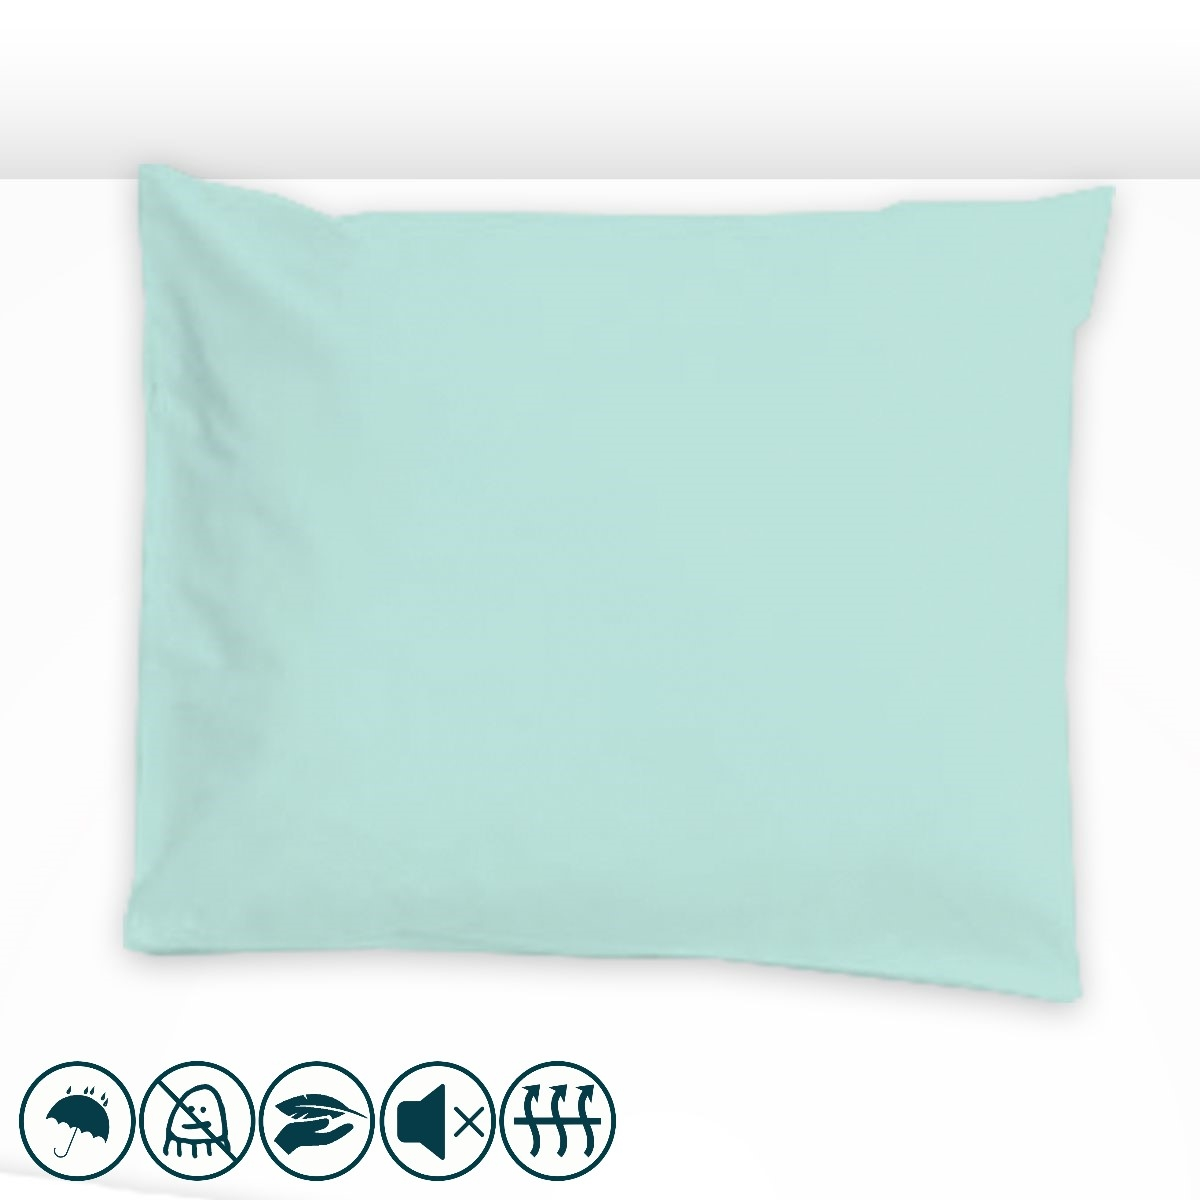 taie d 39 oreiller anti acariens unie bleu clair louis lesec. Black Bedroom Furniture Sets. Home Design Ideas